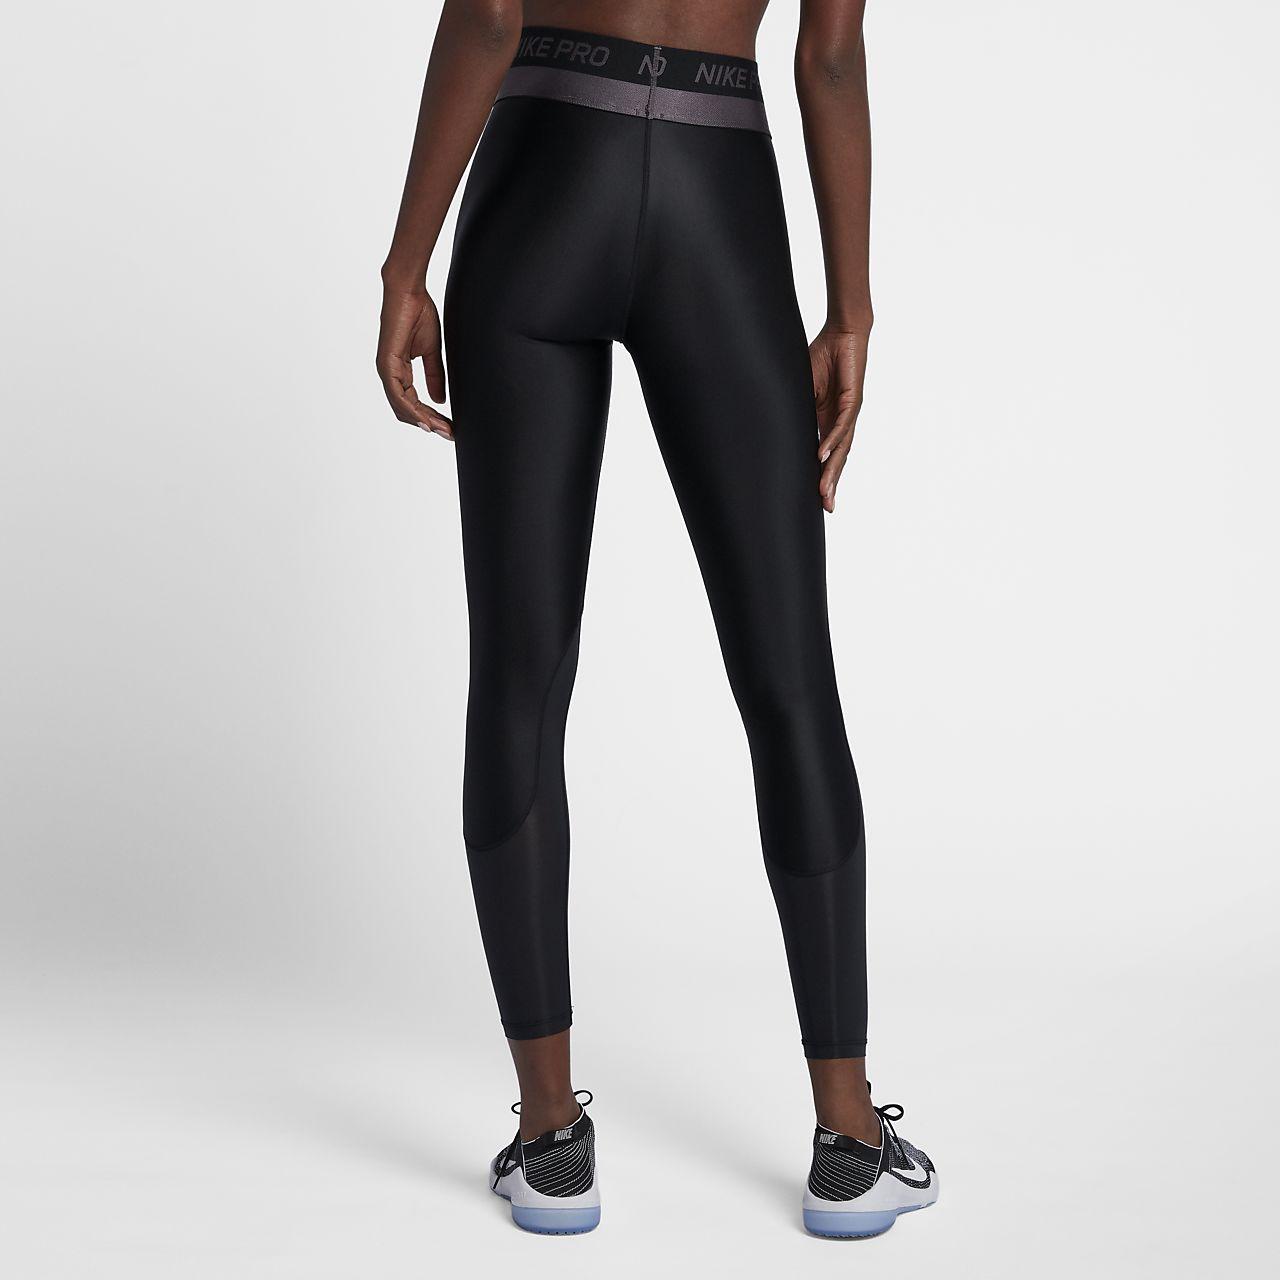 c03ce24620 Nike Pro HyperCool Women's Mid-Rise Training Tights. Nike.com IL